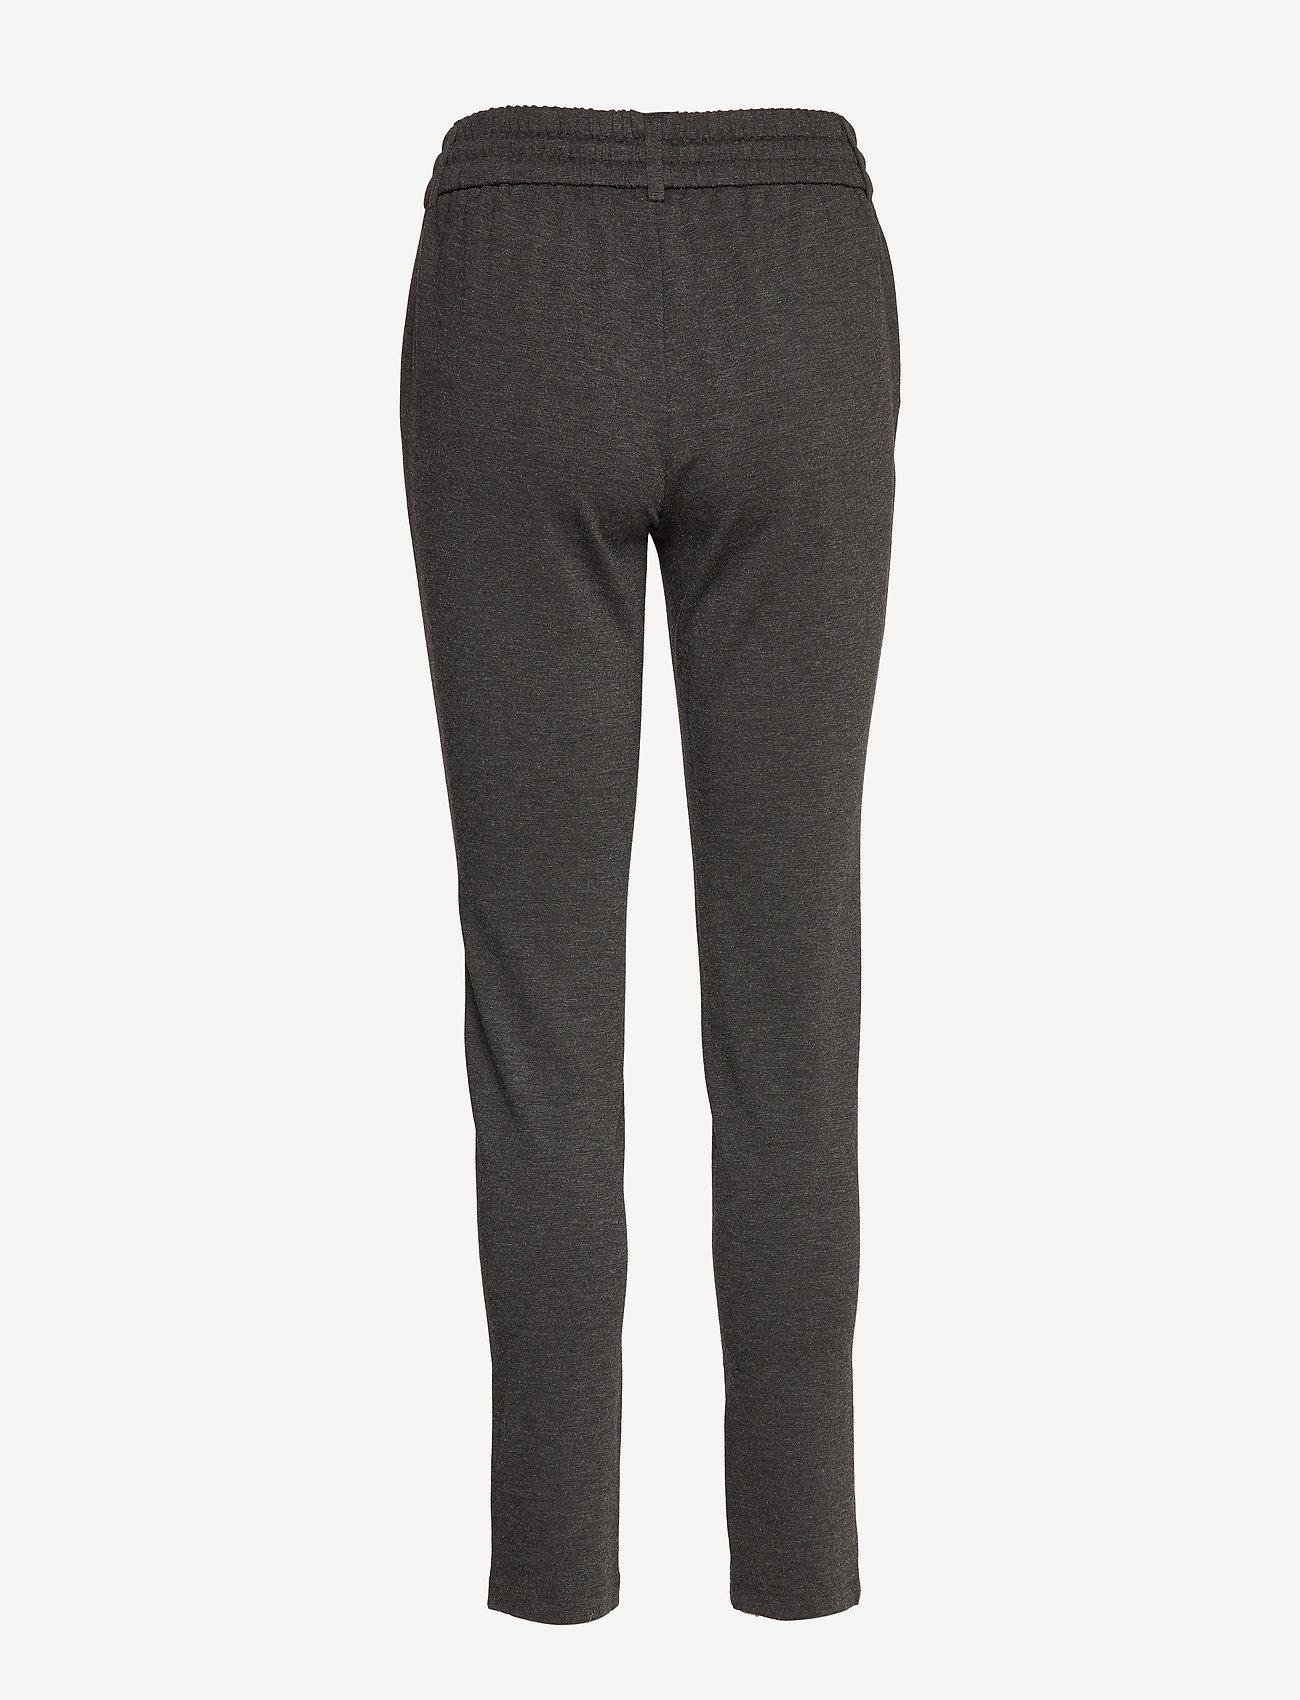 Brandtex Casual Pants - Byxor Grey Mell.